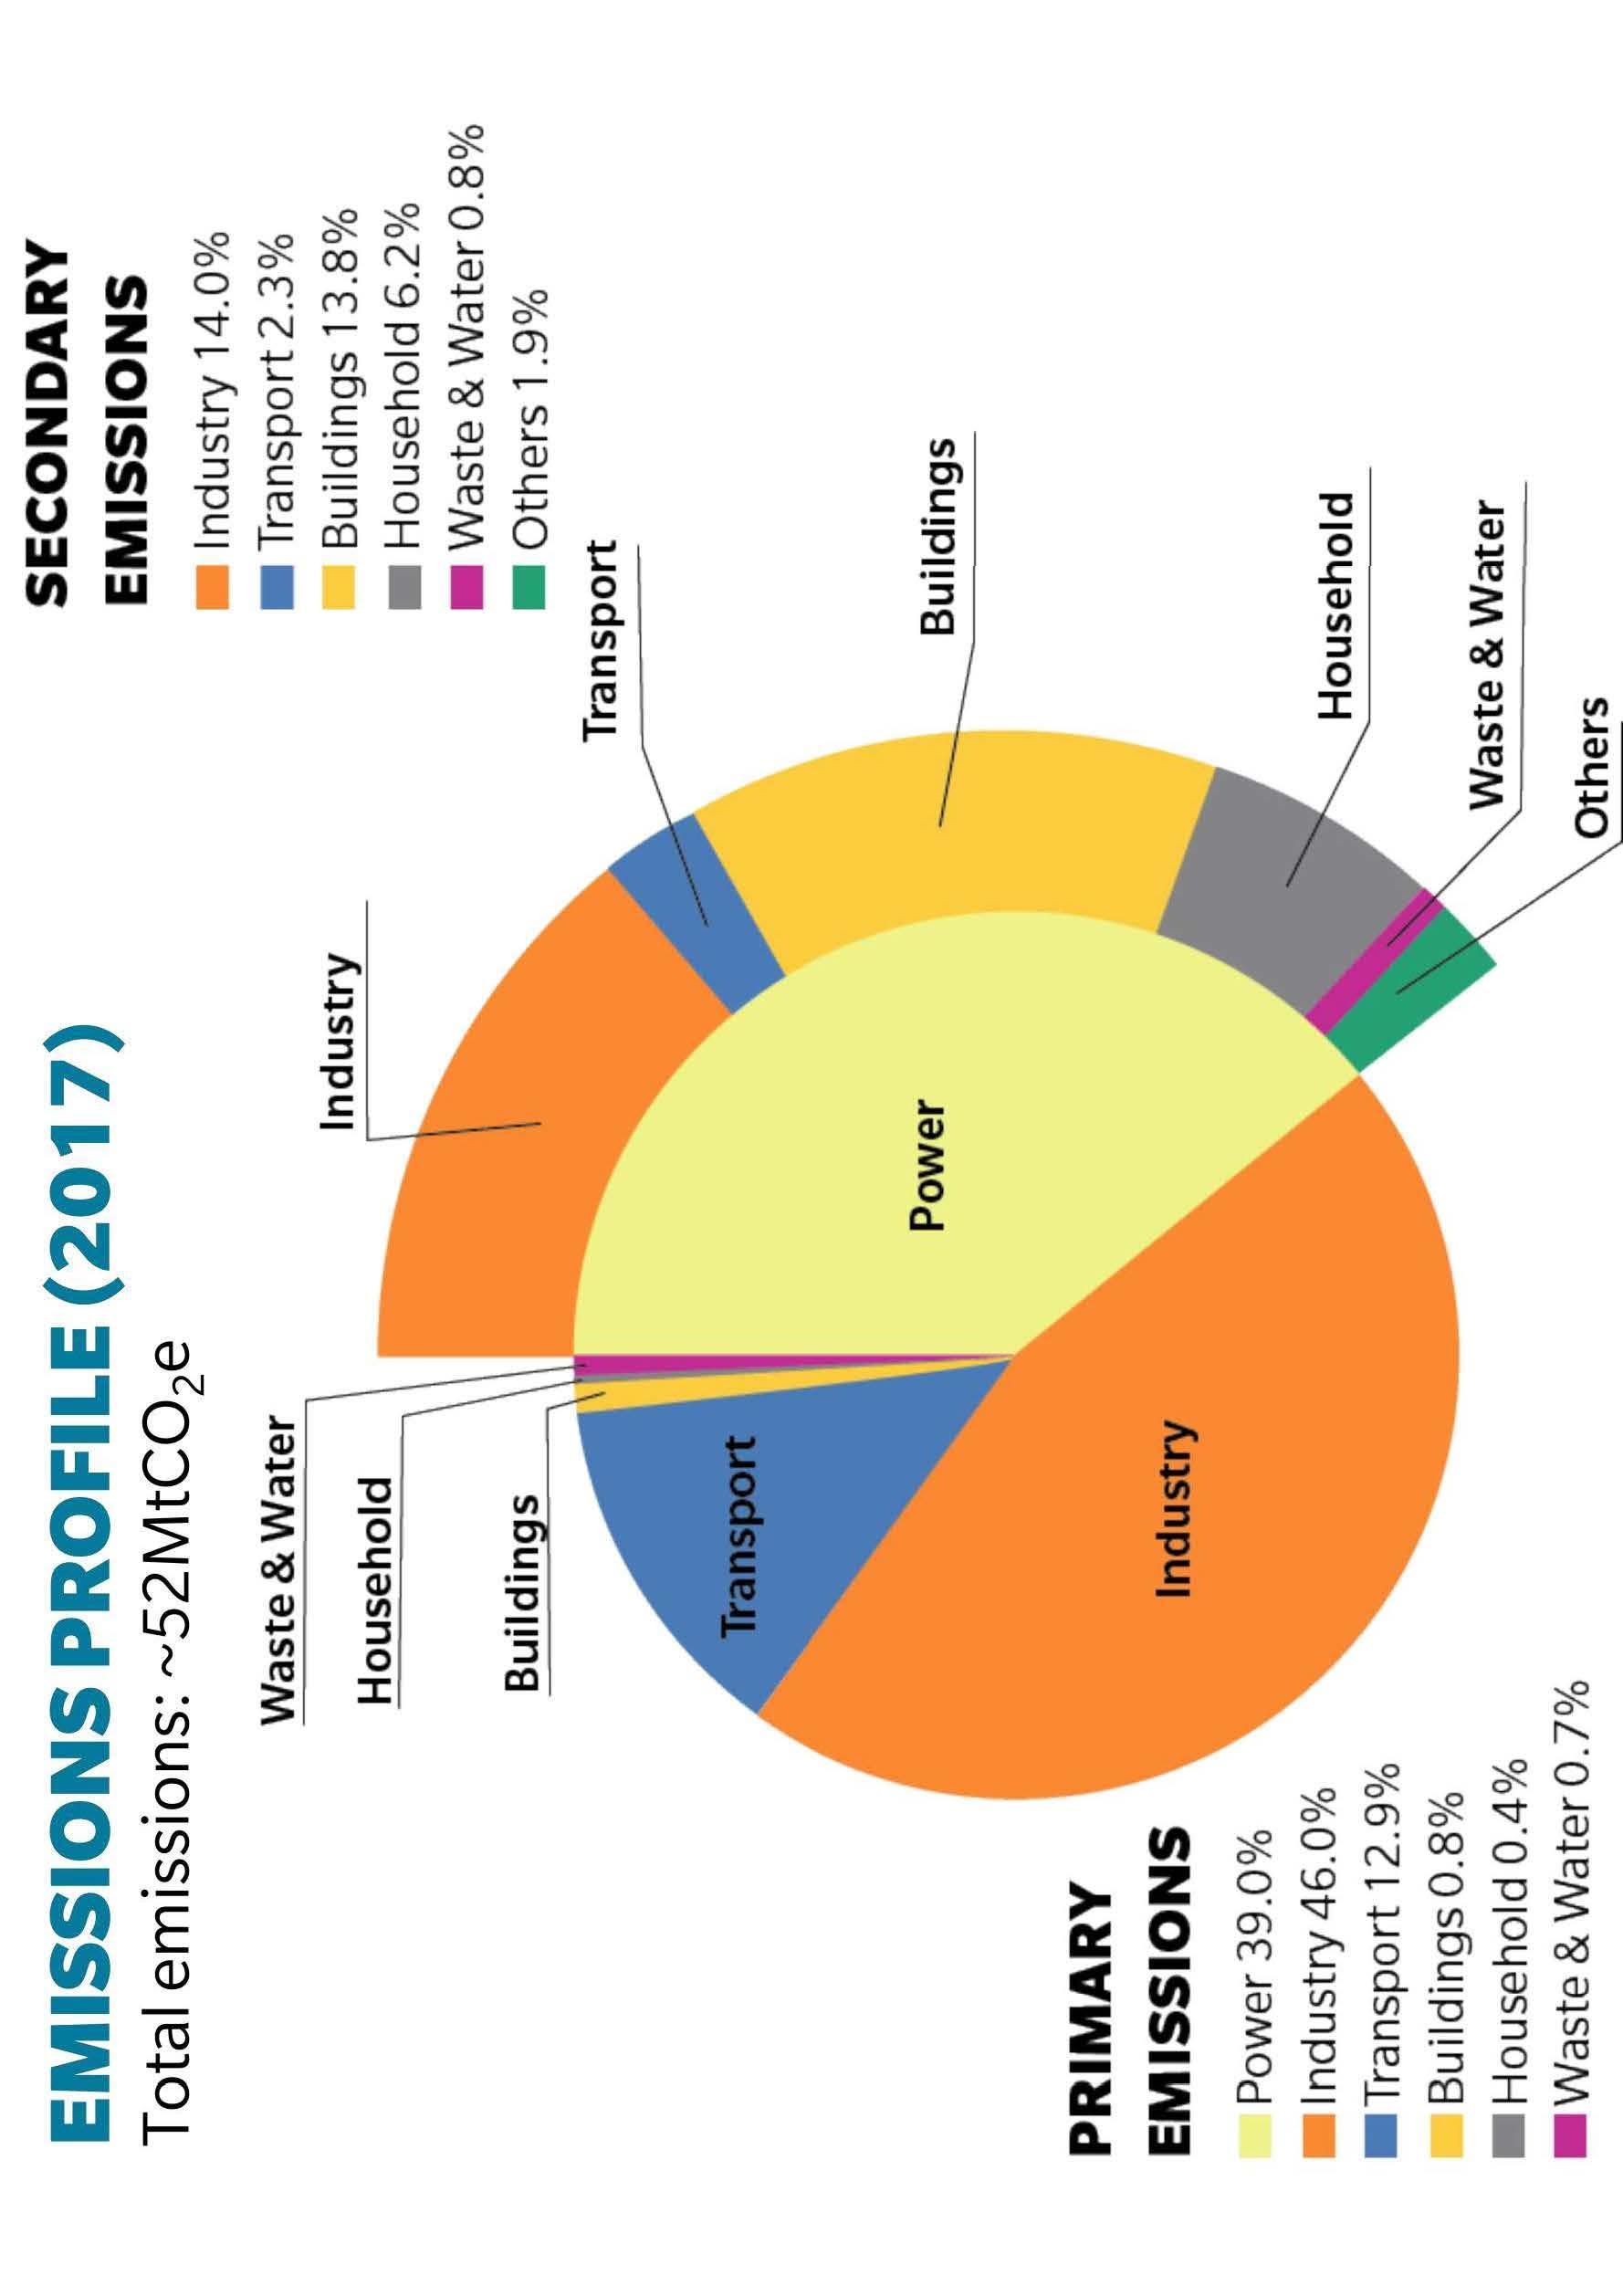 2017-emissions-profile